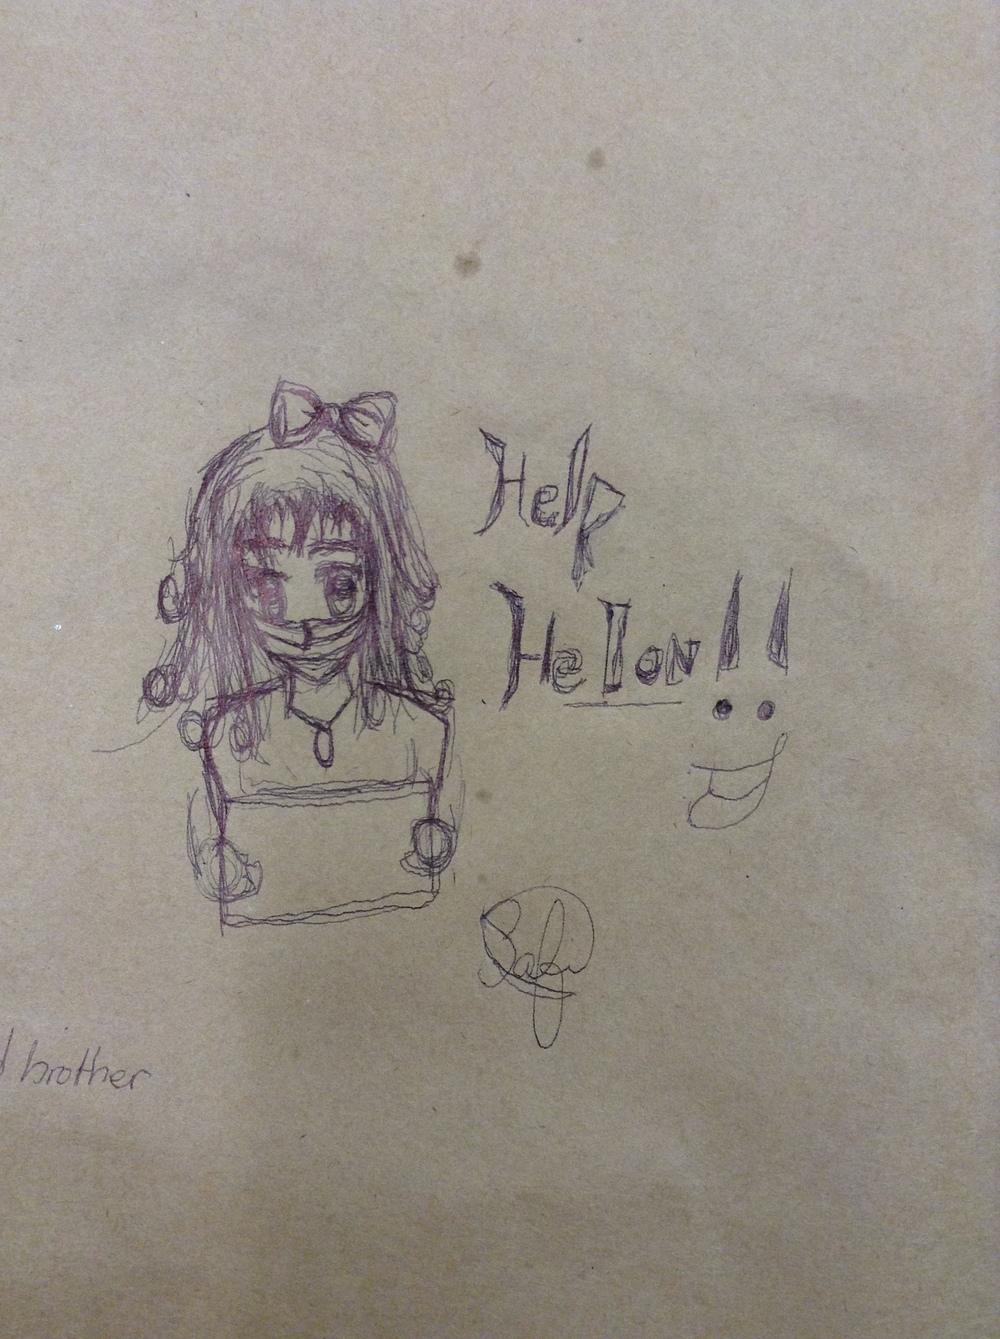 Help Helen!